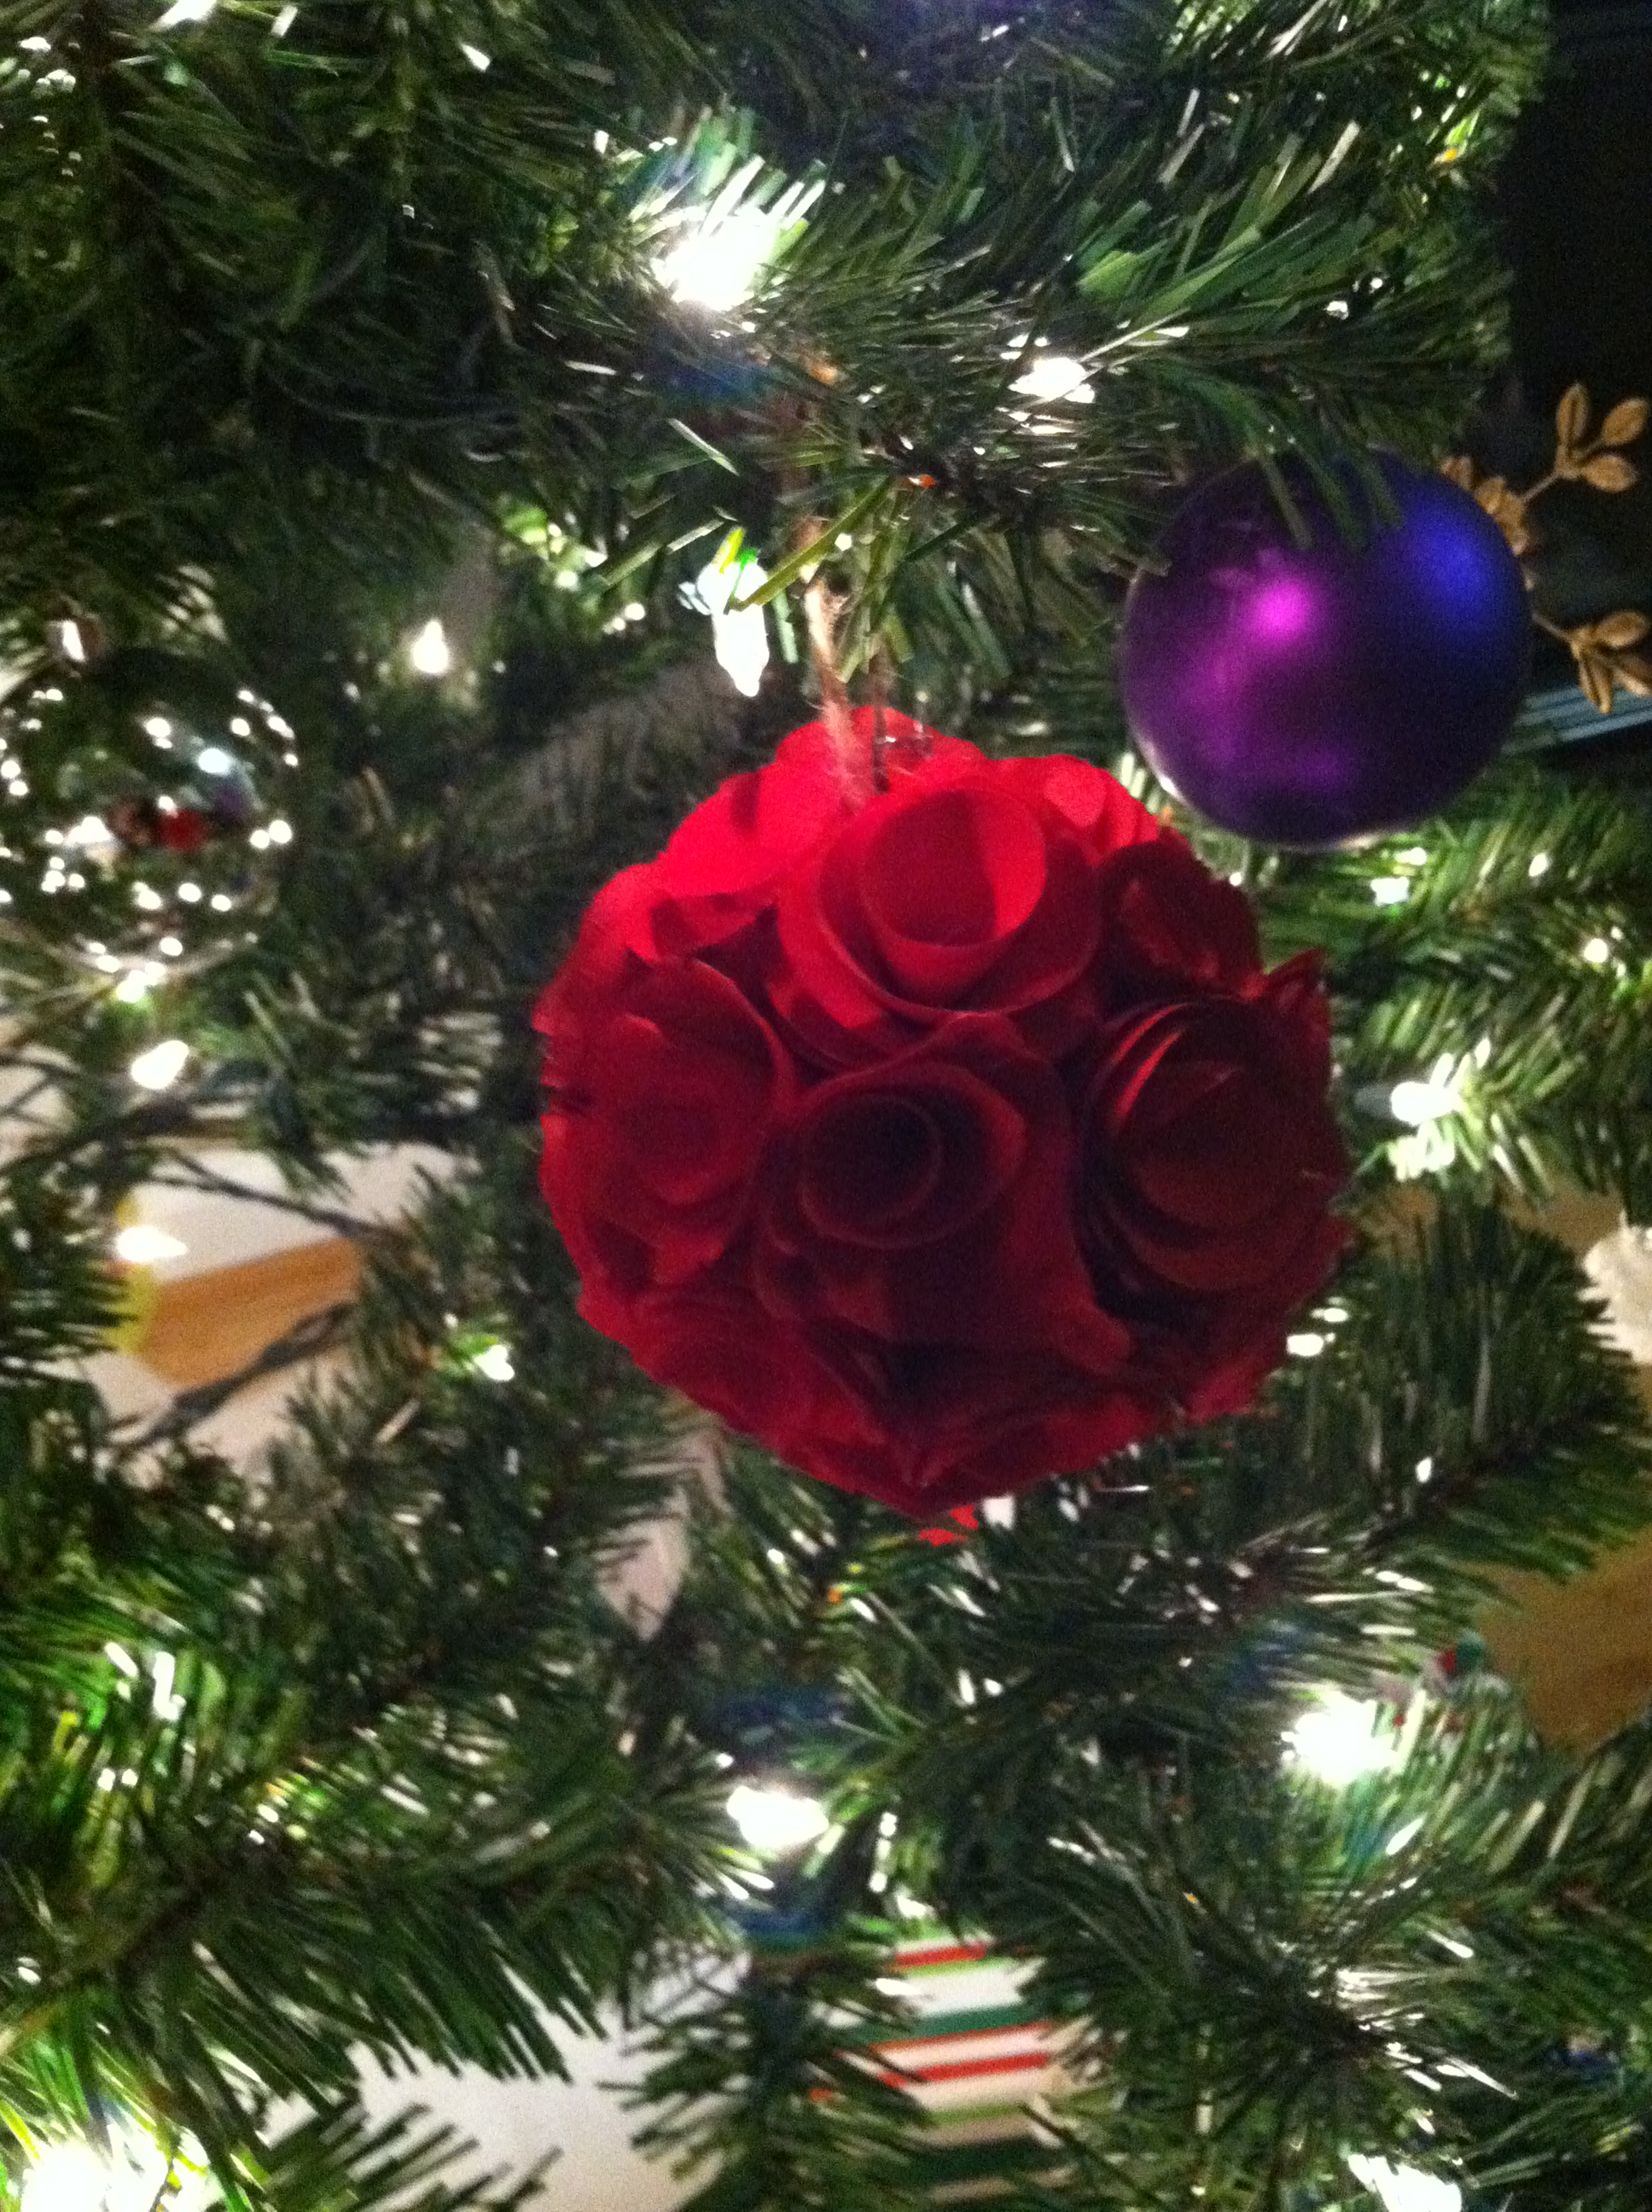 Rose christmas ornament - Flower Christmas Ornament Red Rose